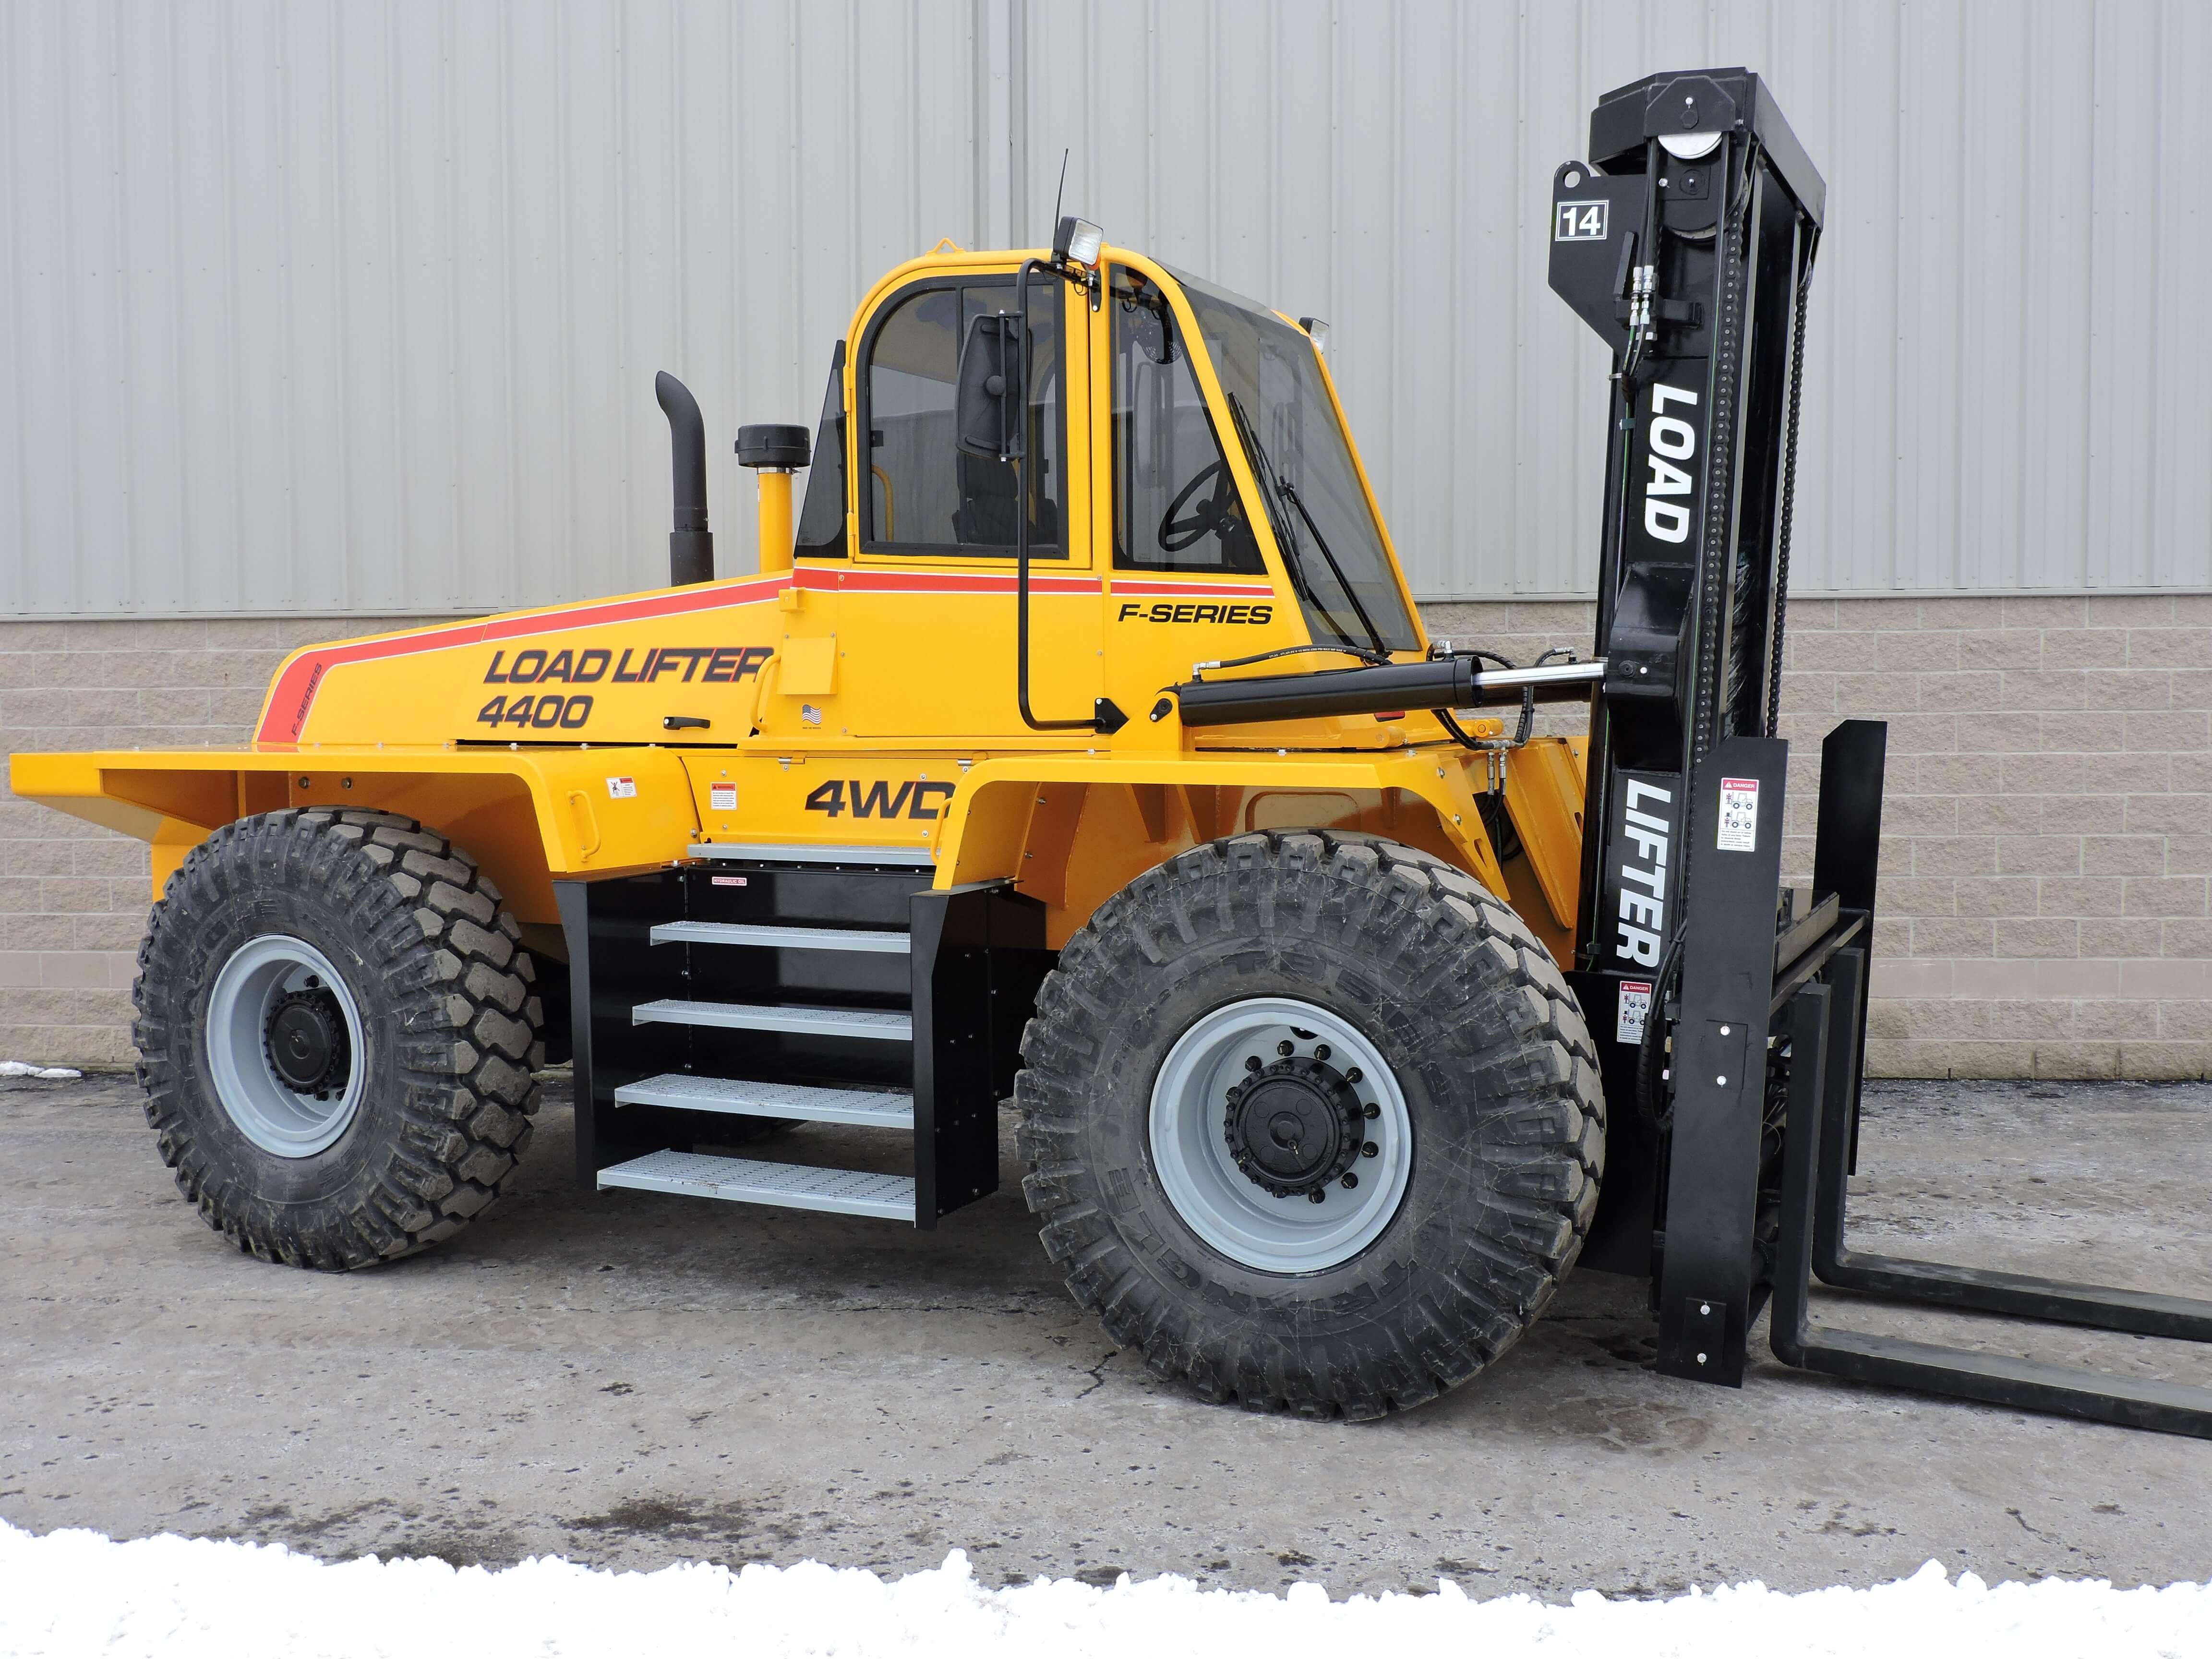 Load Lifter 4400 series All Terrain Forklift